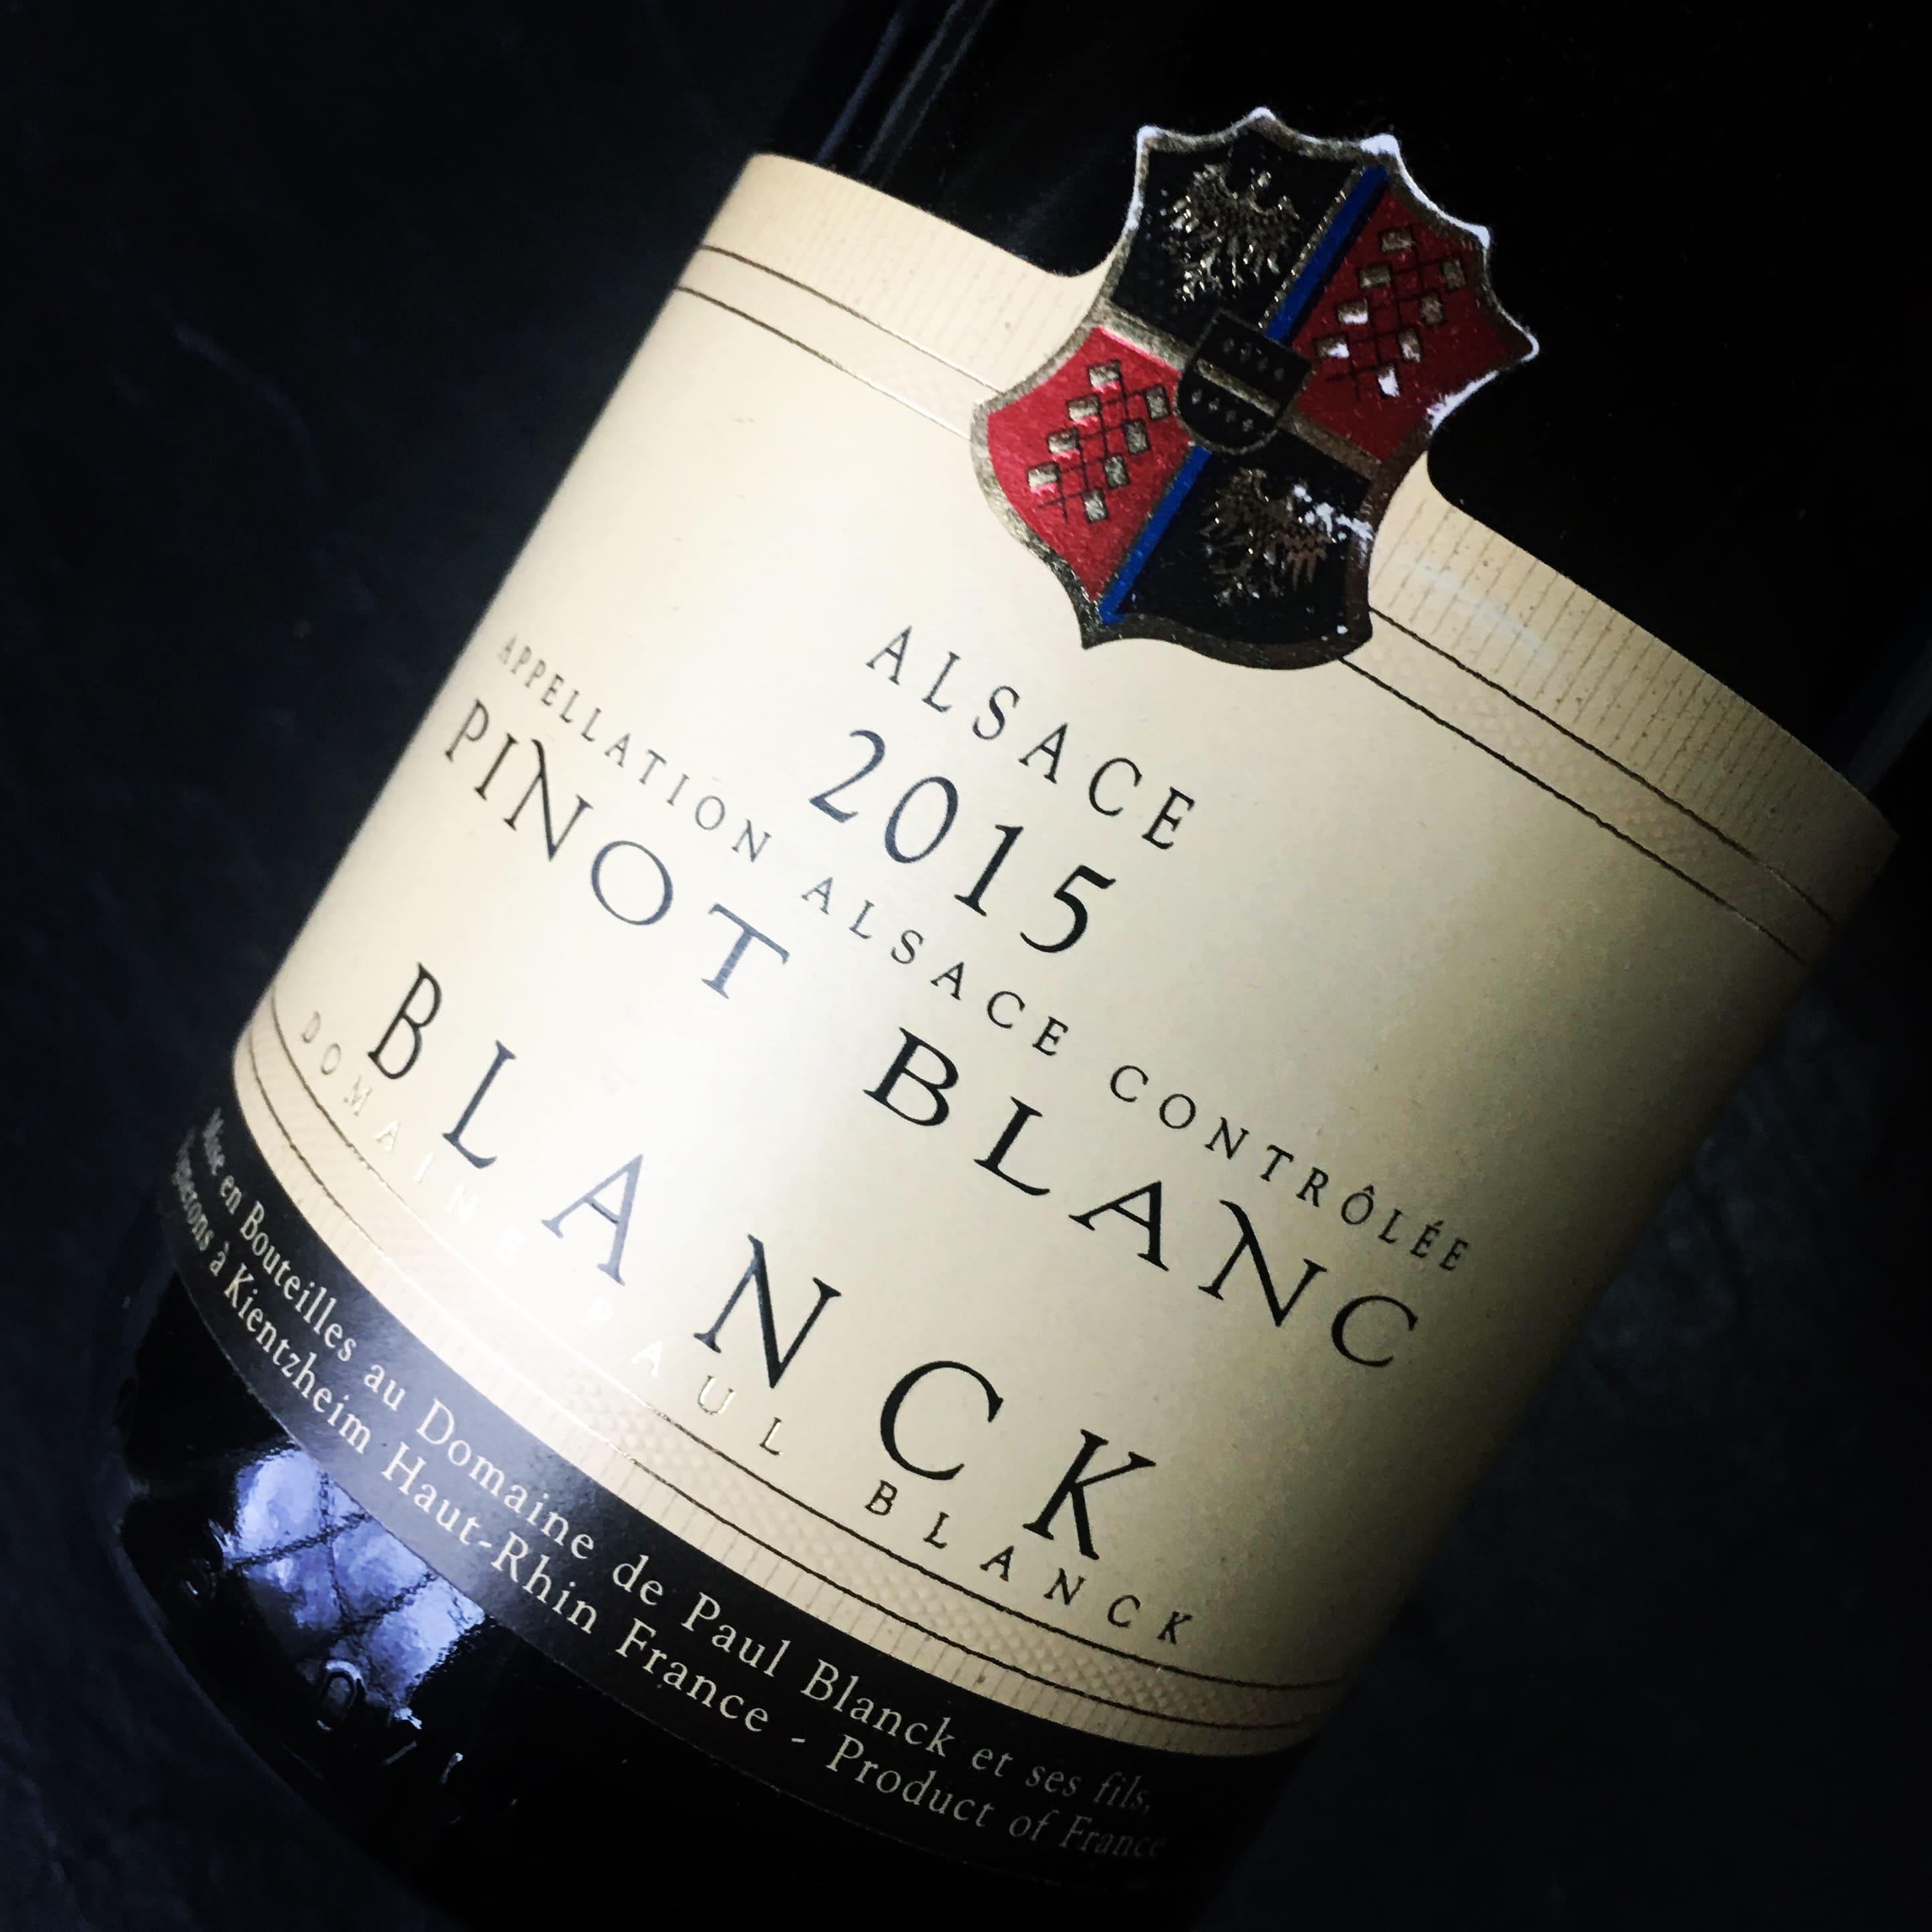 Paul Blanck Pinot Blanc Alsace 2015